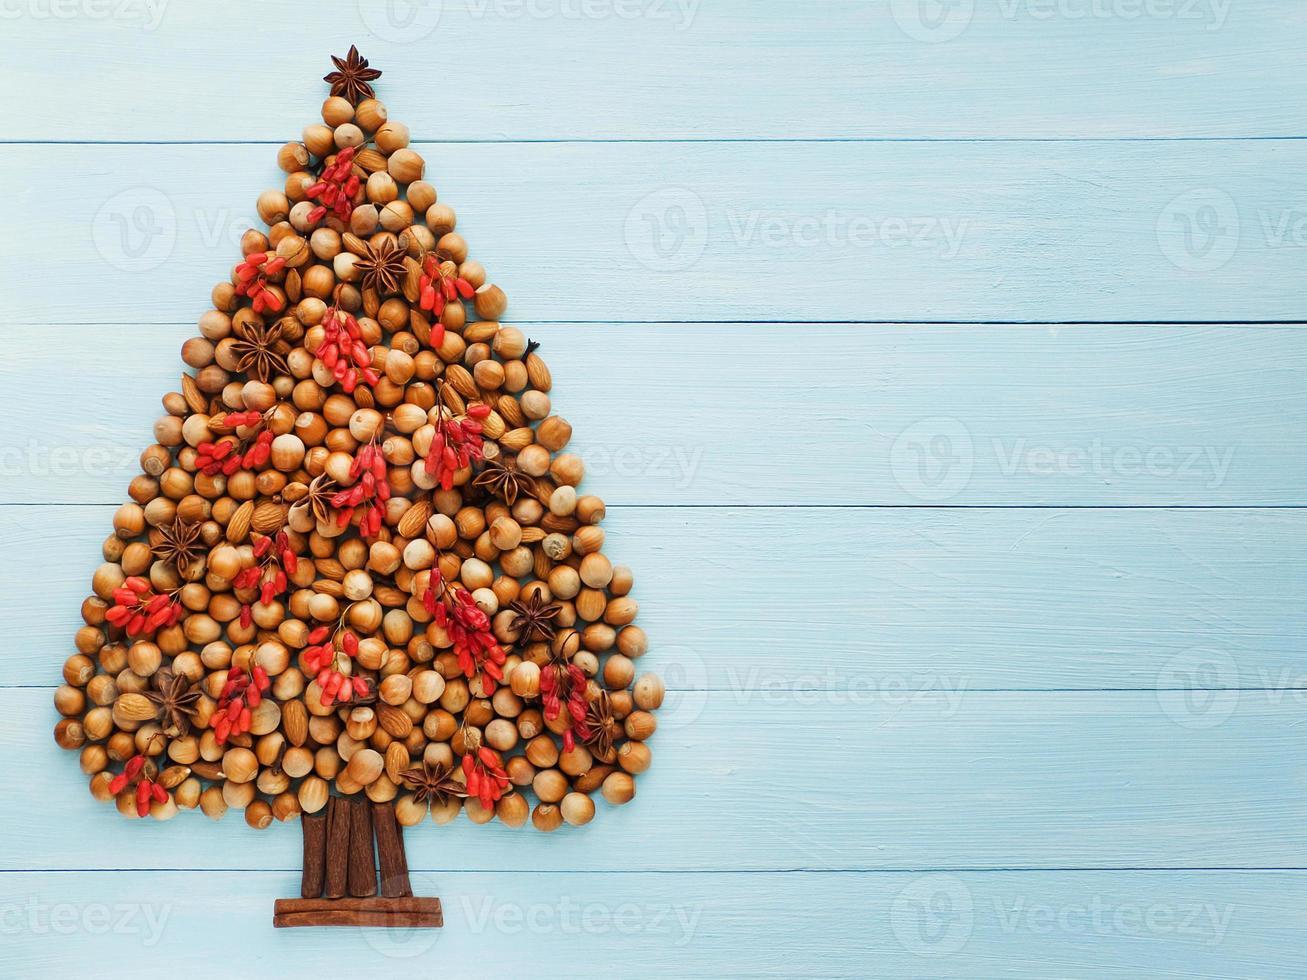 kerstboom foto